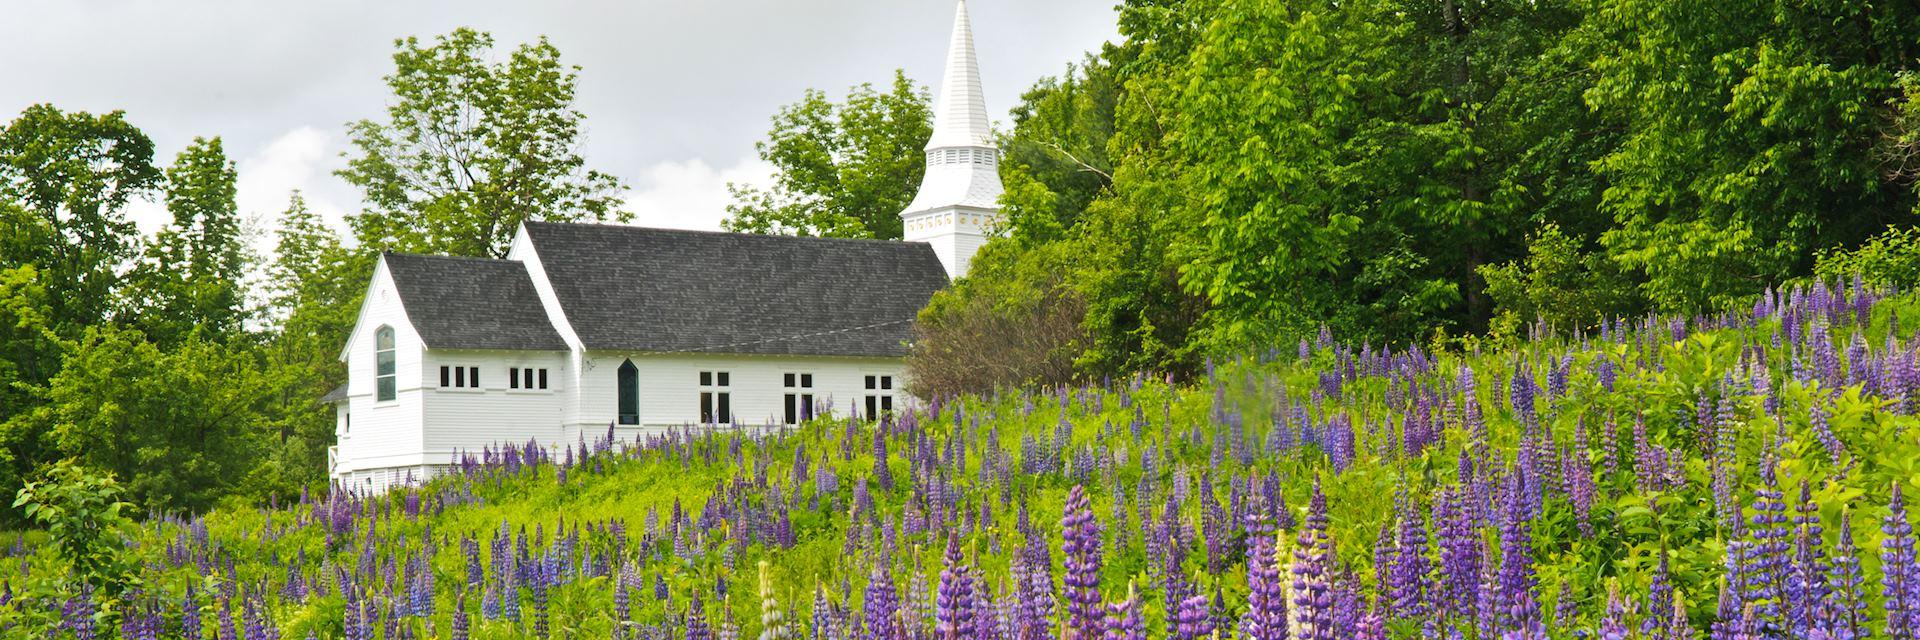 Church in Sugar Hill